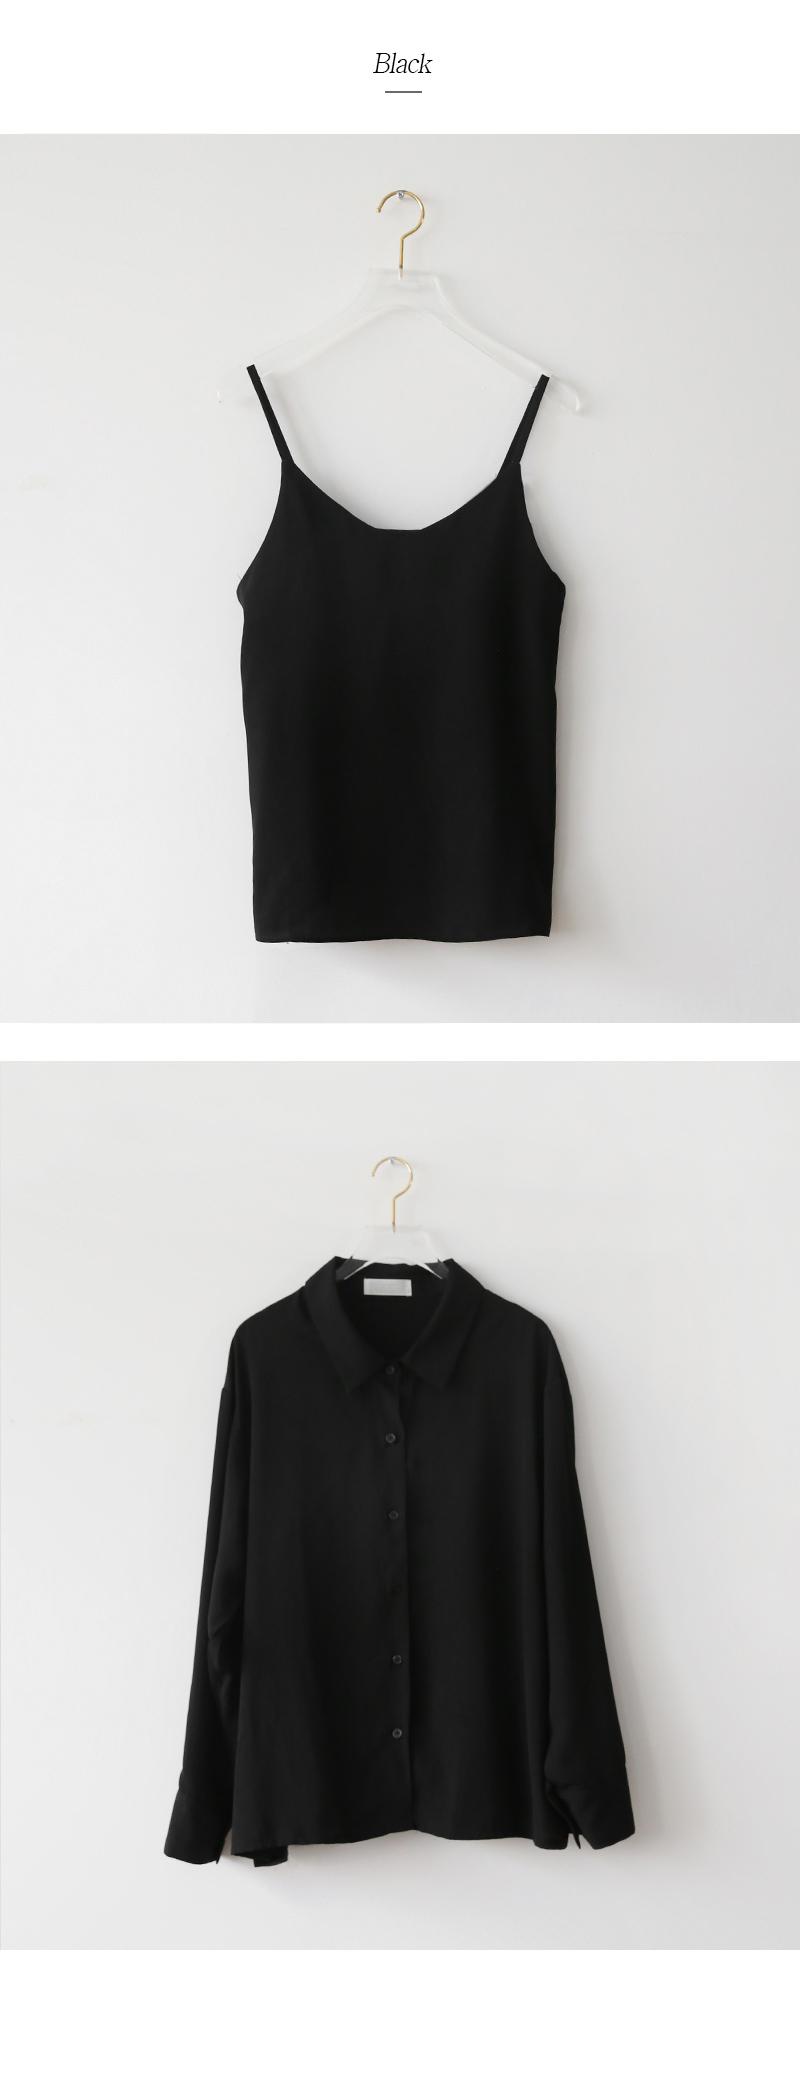 Kroide Nash Set Shirt